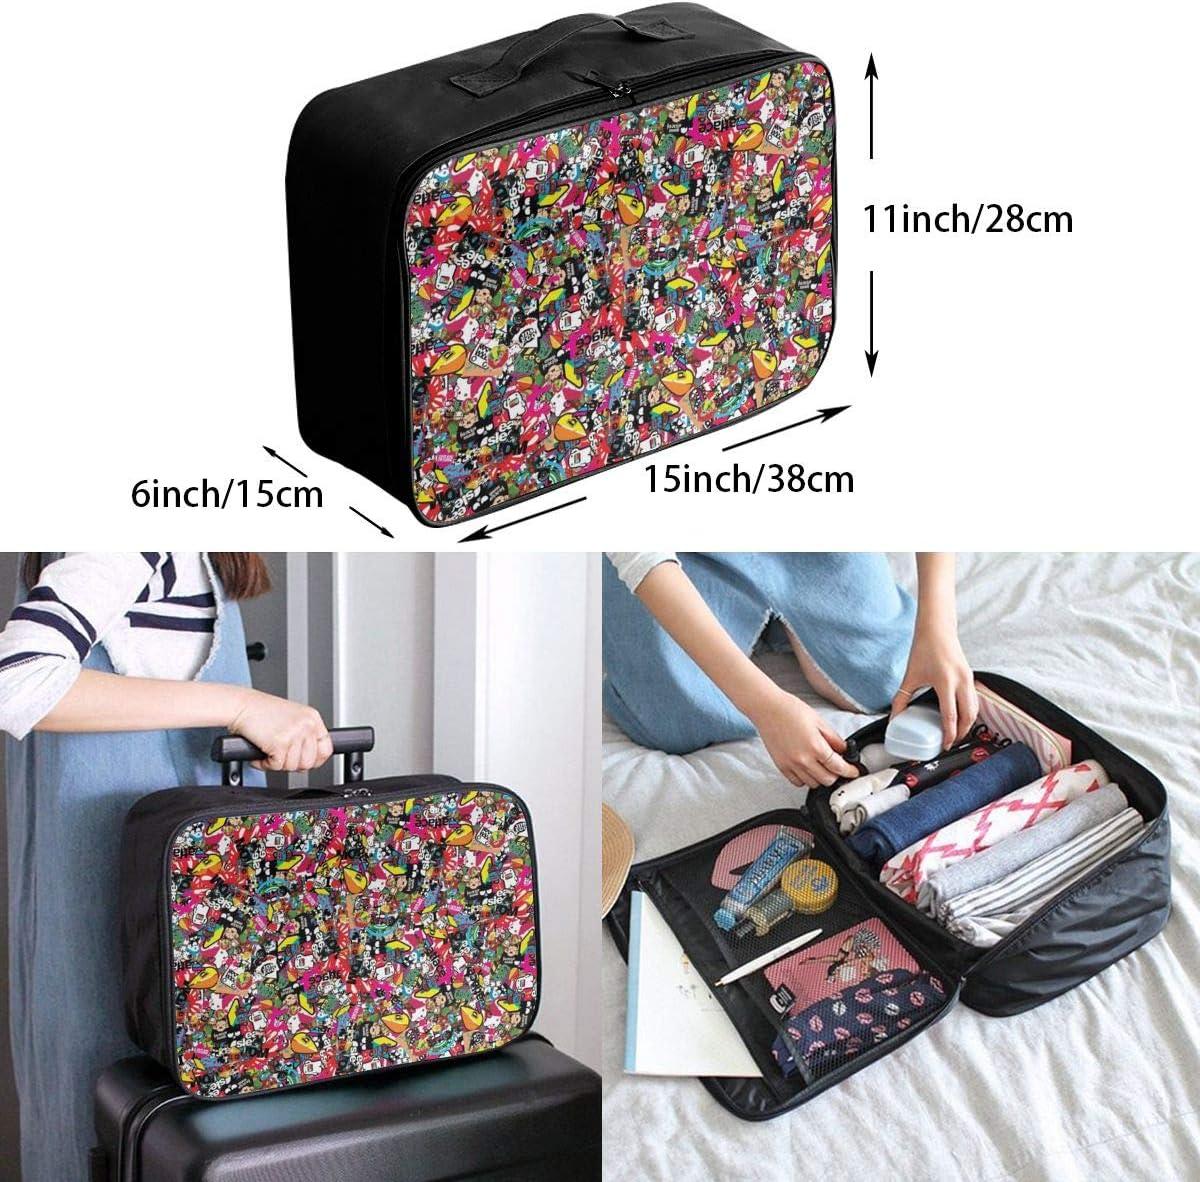 Yunshm Background Style Sticker Texture Wallpaper Customized Trolley Handbag Waterproof Unisex Large Capacity For Business Travel Storage